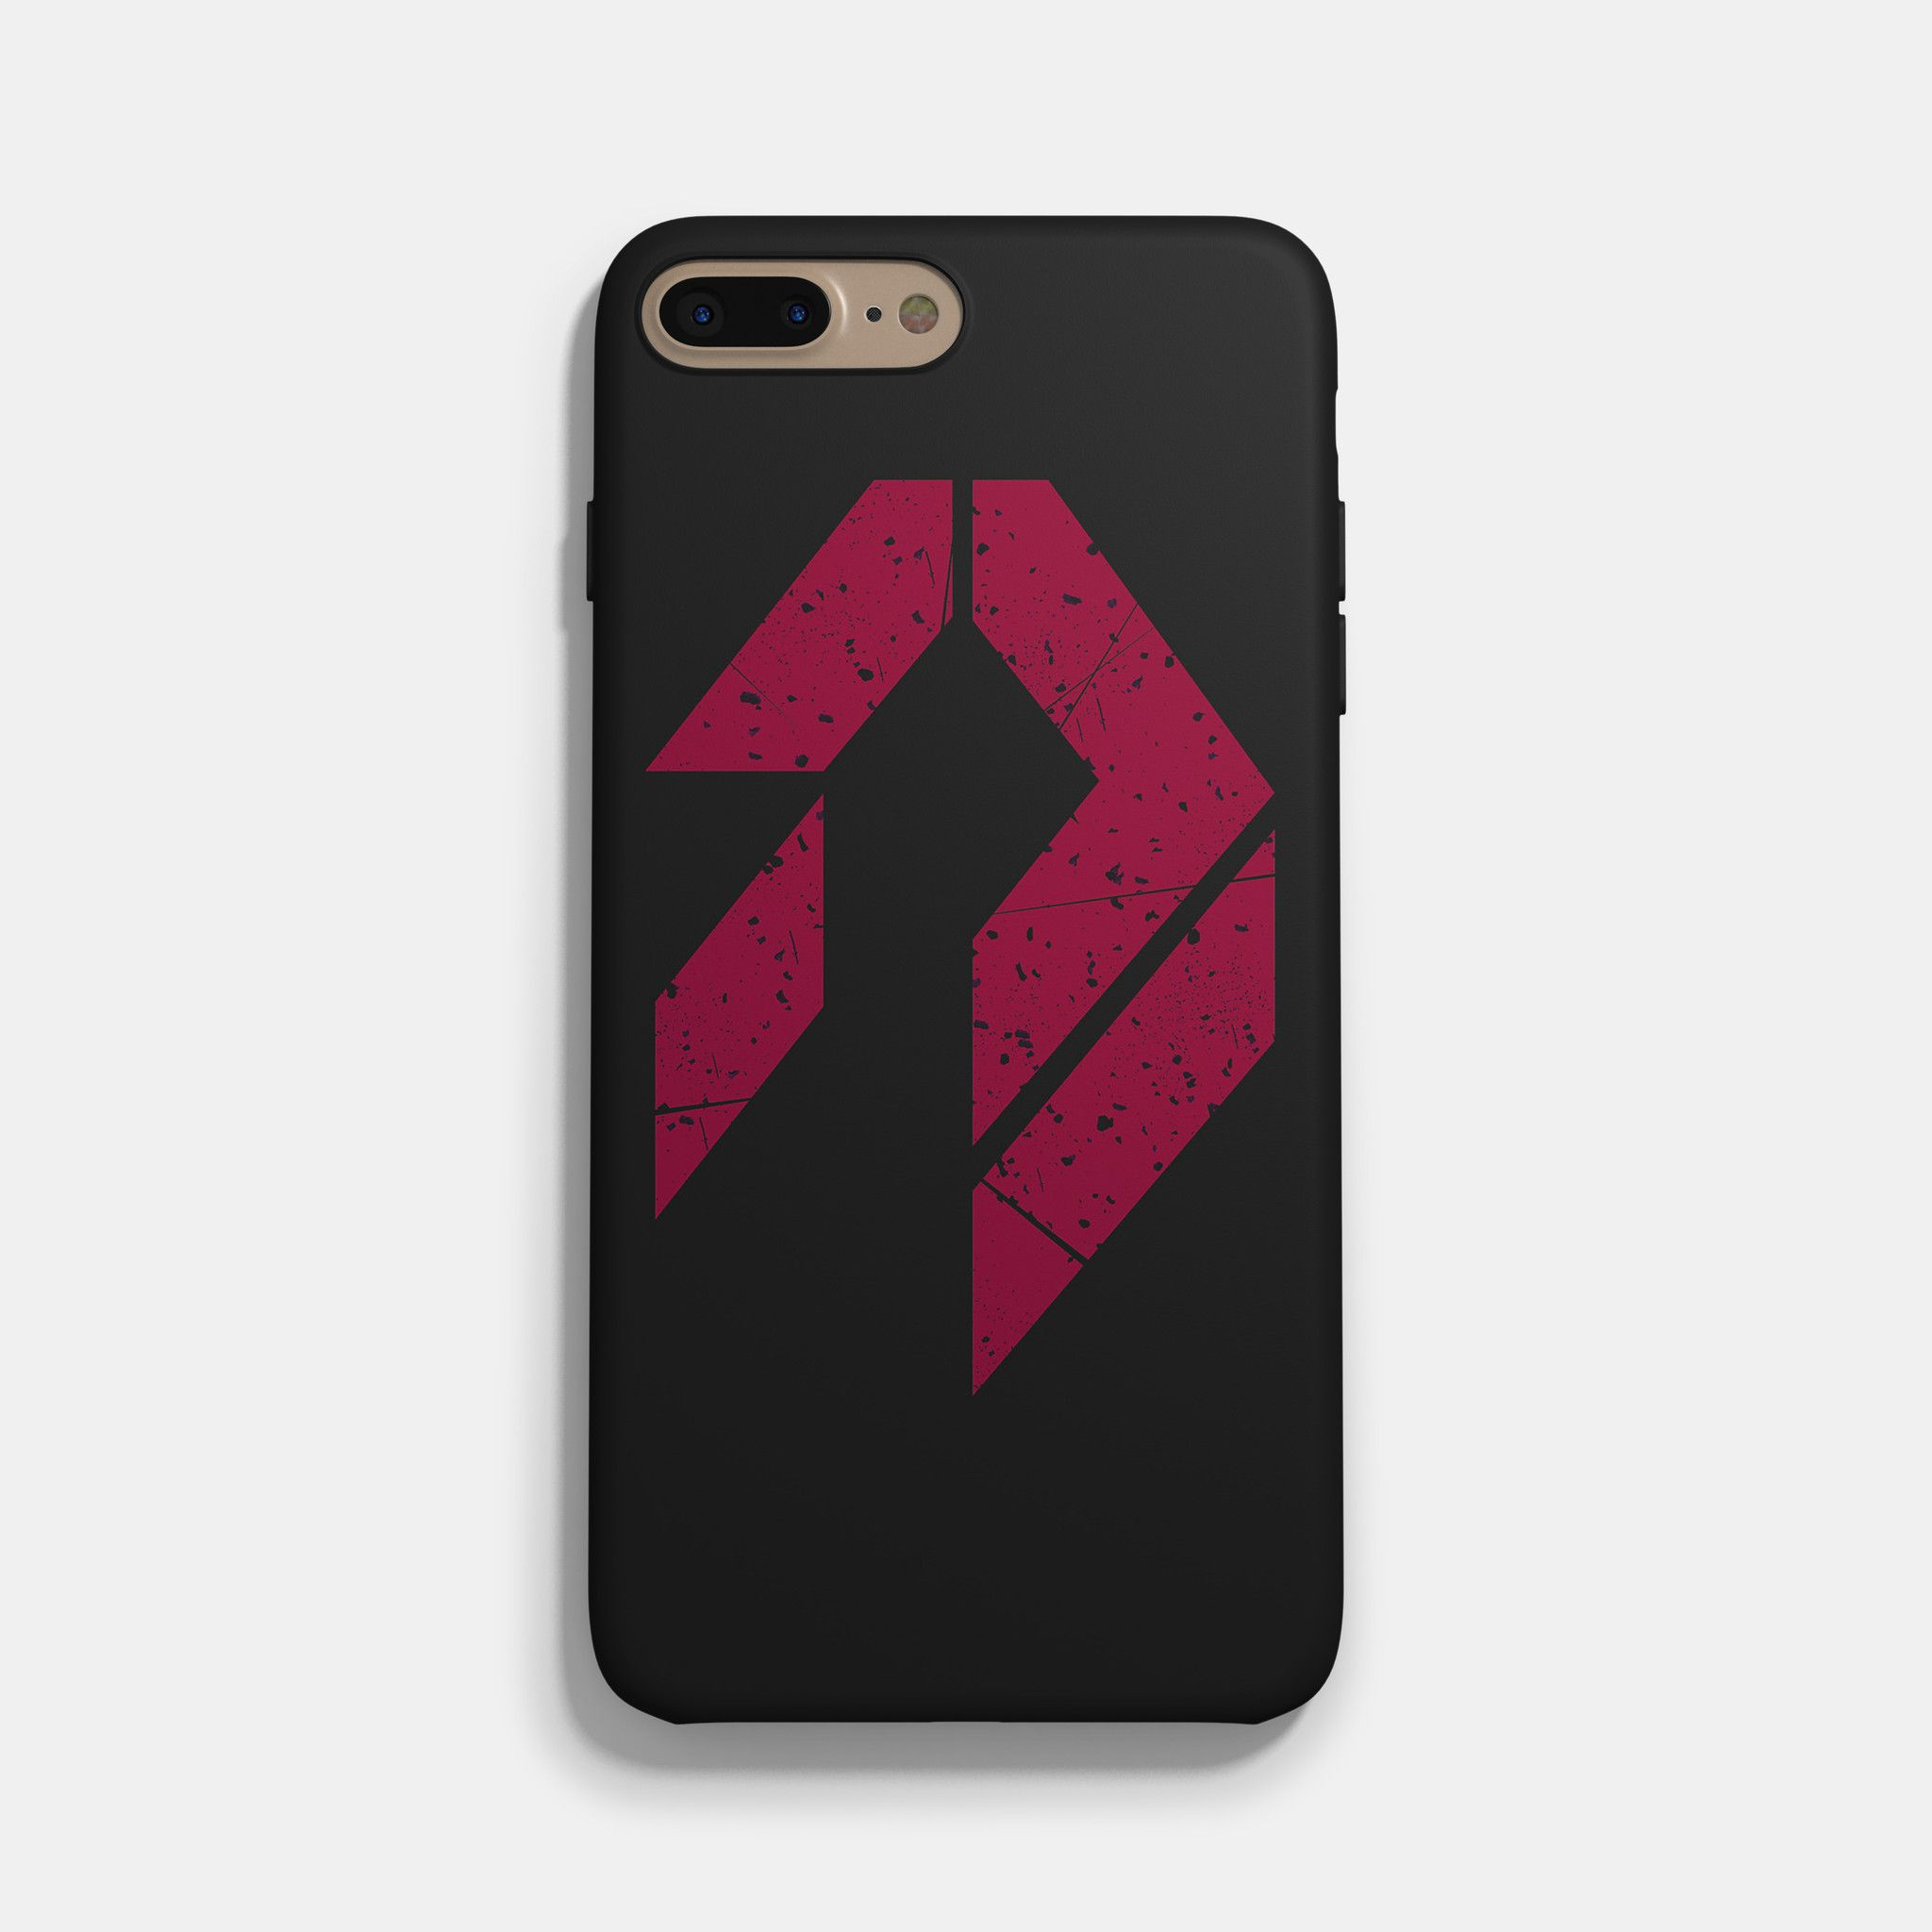 destiny phone case iphone 7